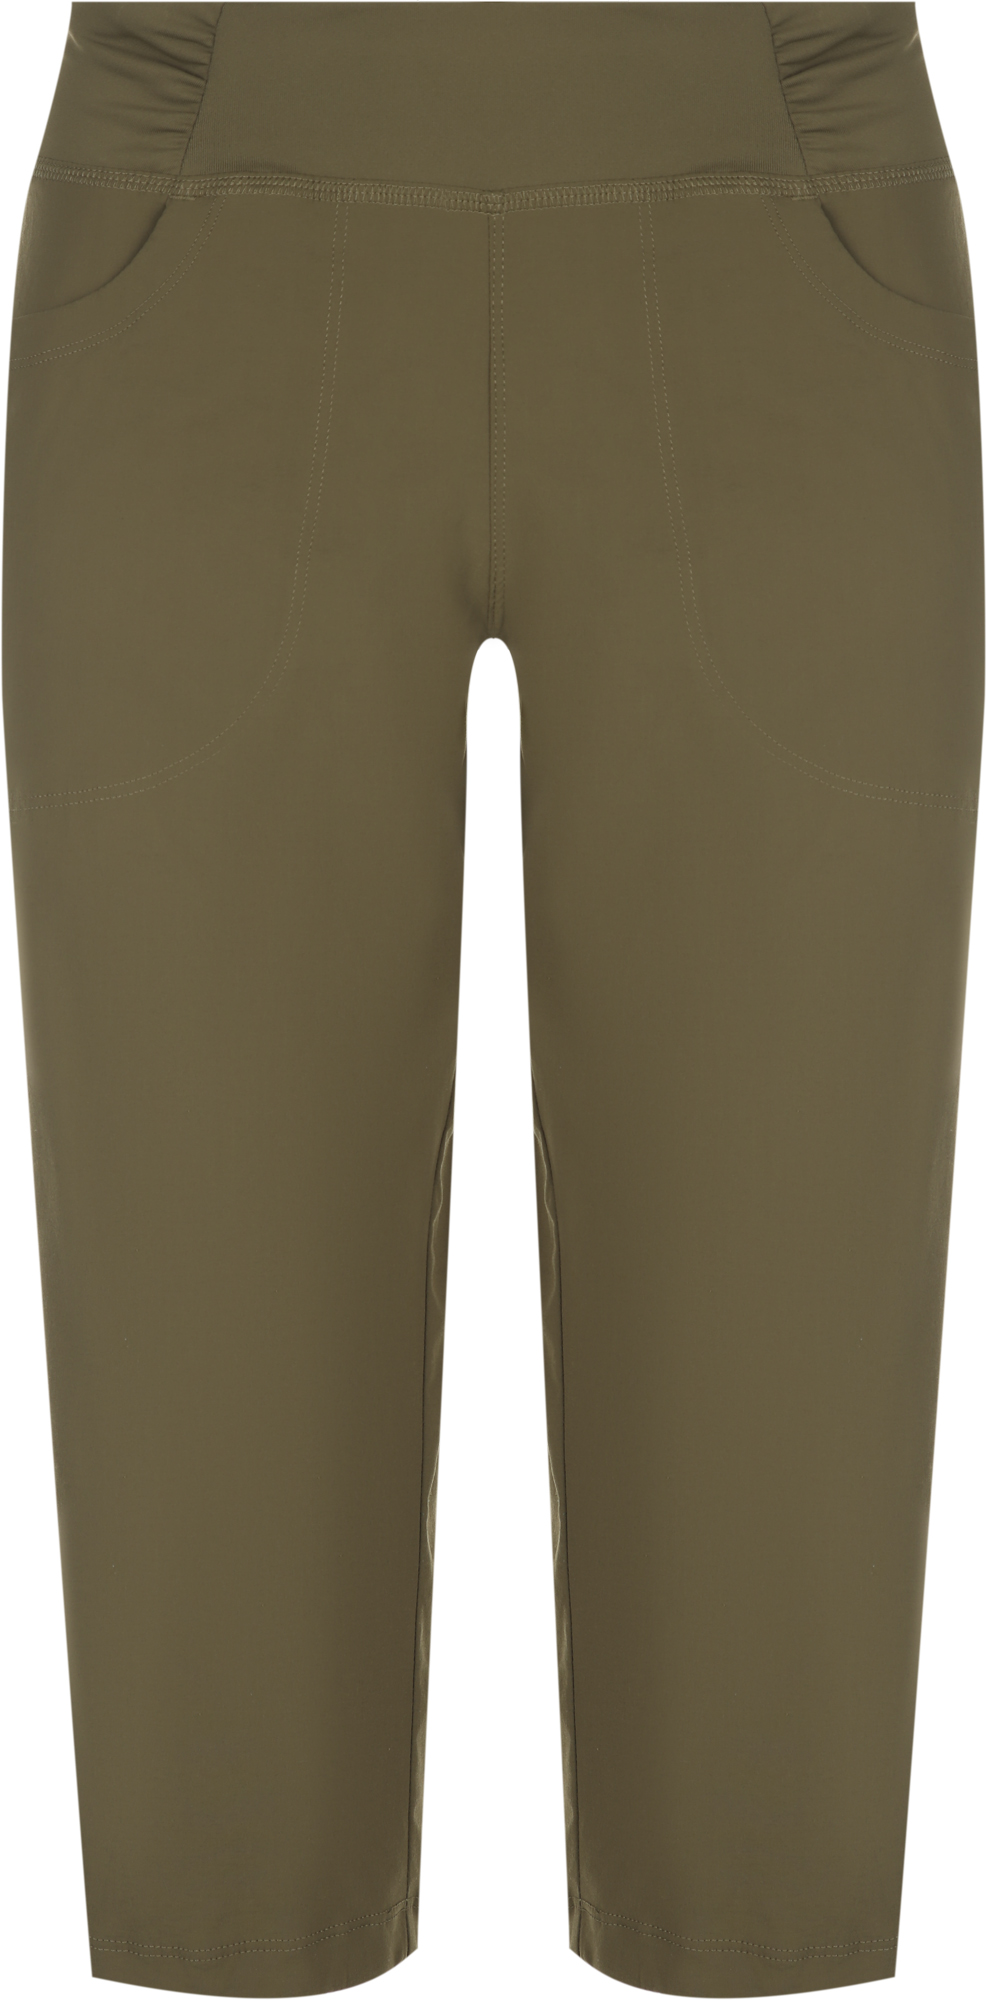 Mountain Hardwear Бриджи женские Mountain Hardwear Dynama™, размер 44 бриджи basler бриджи